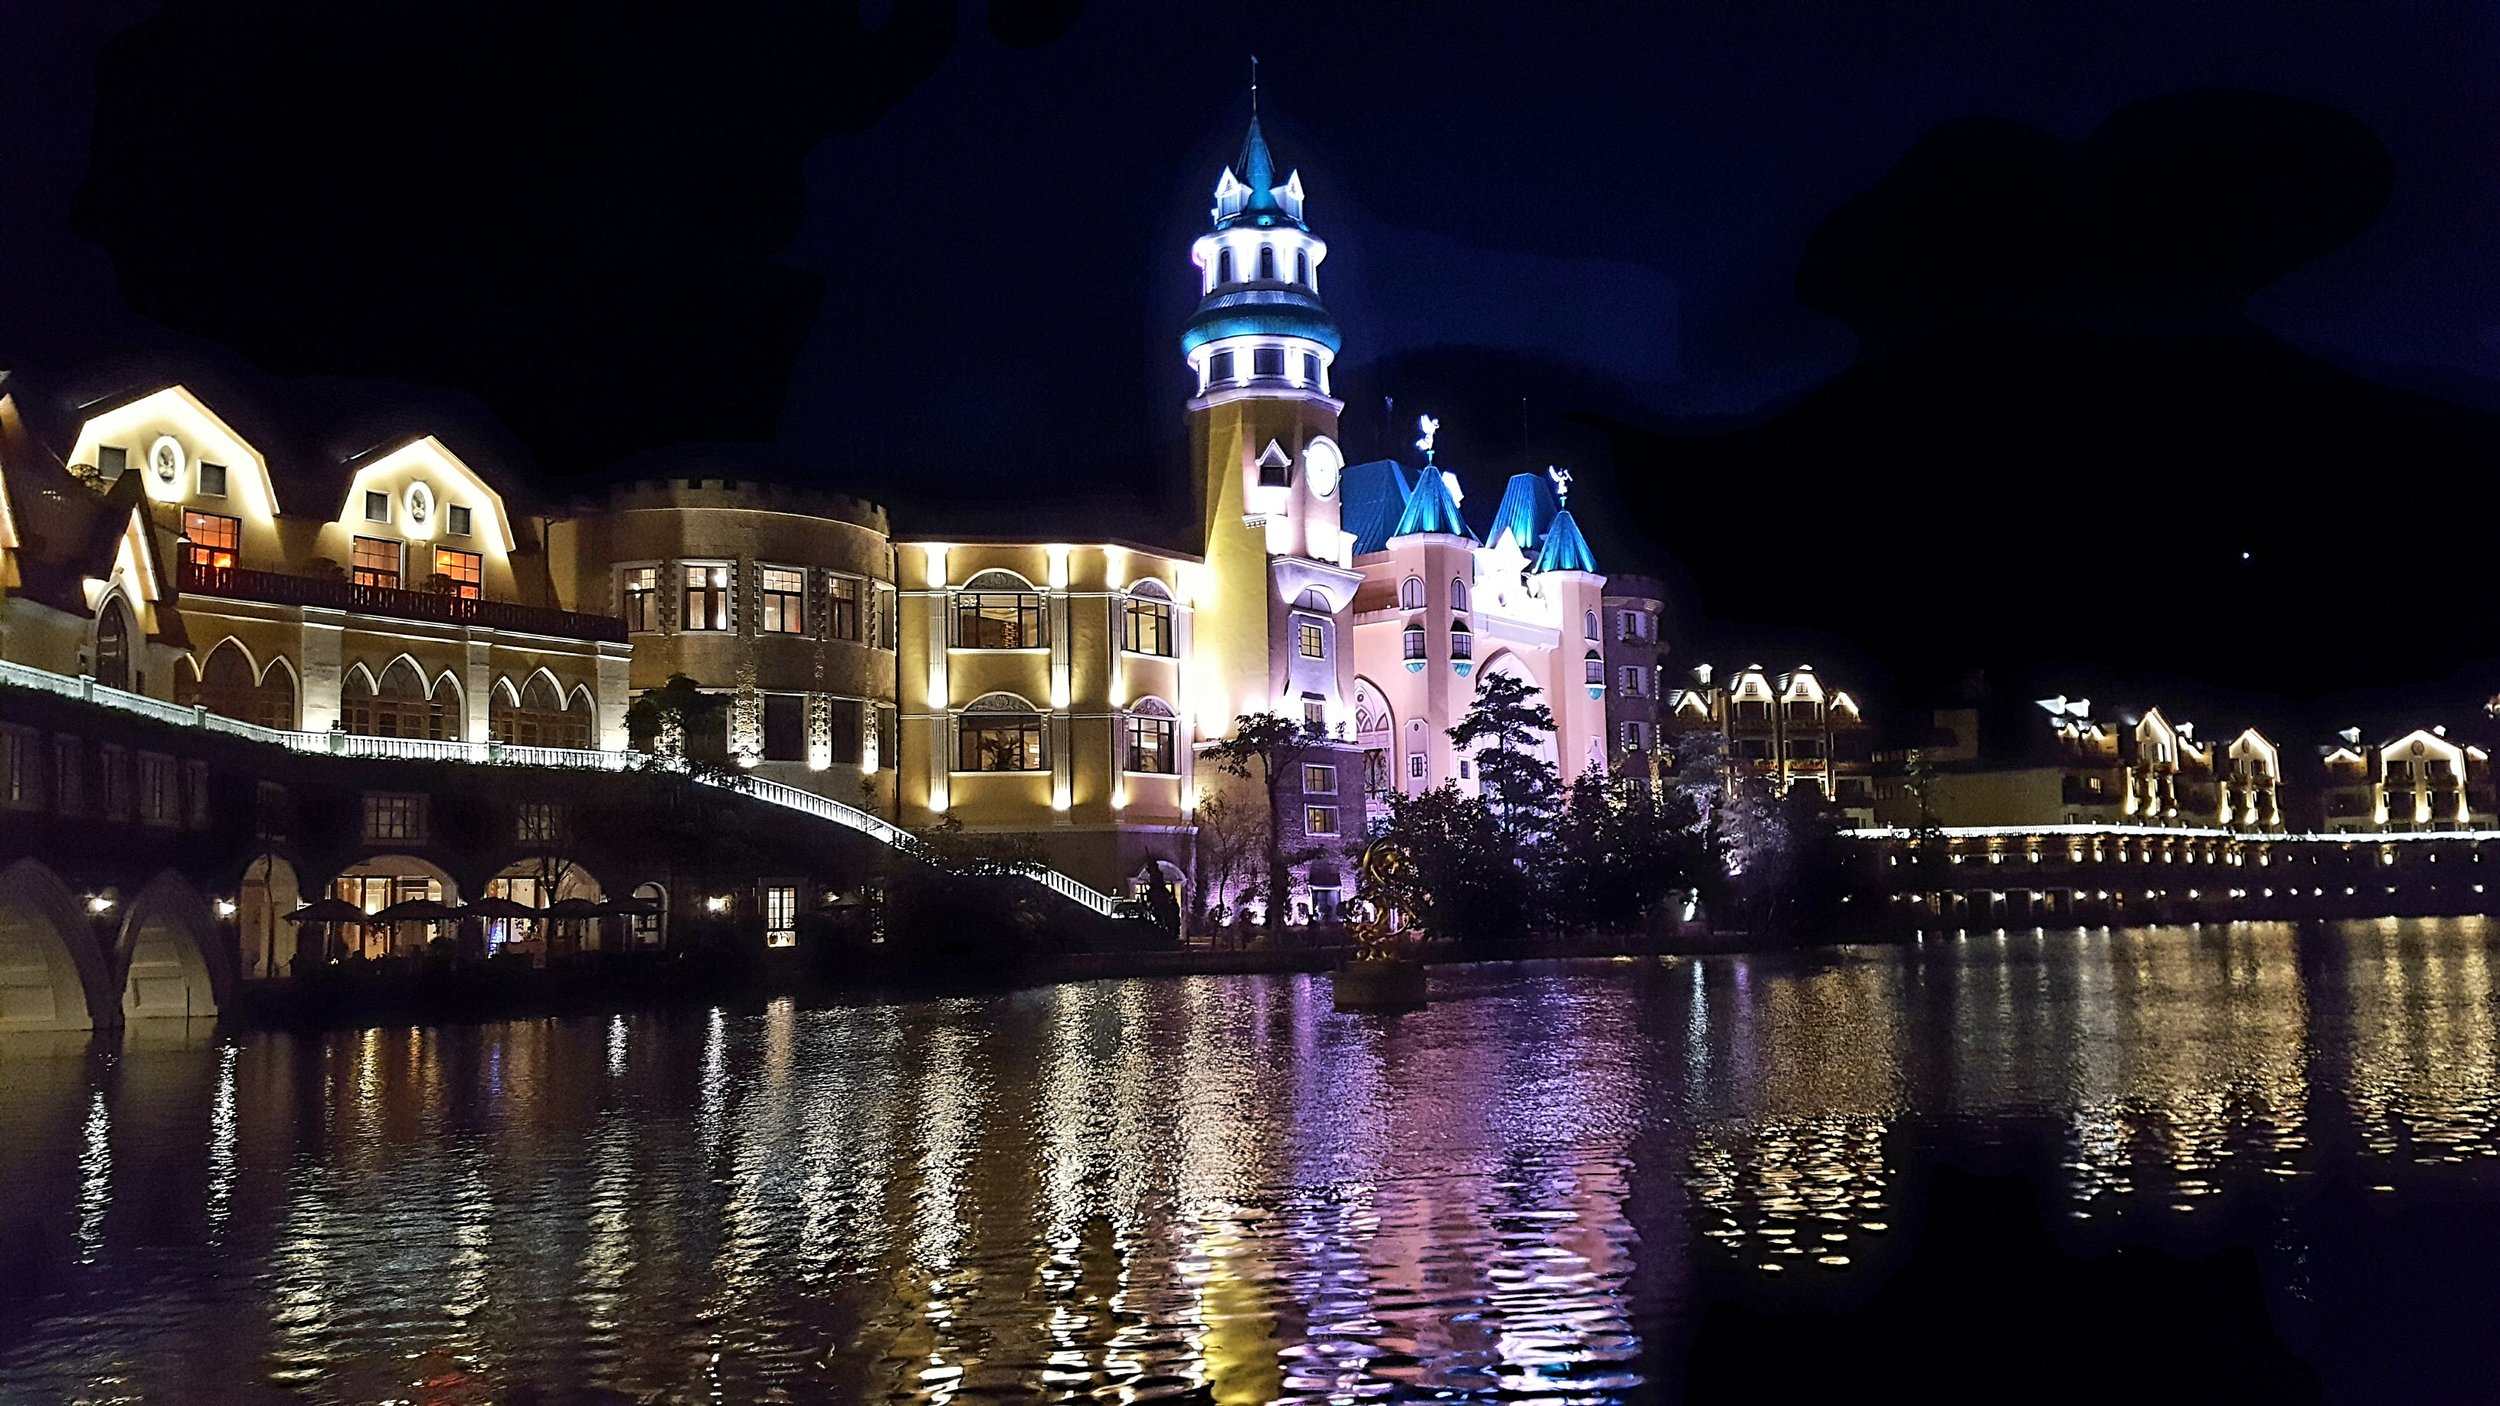 Nighttime in China